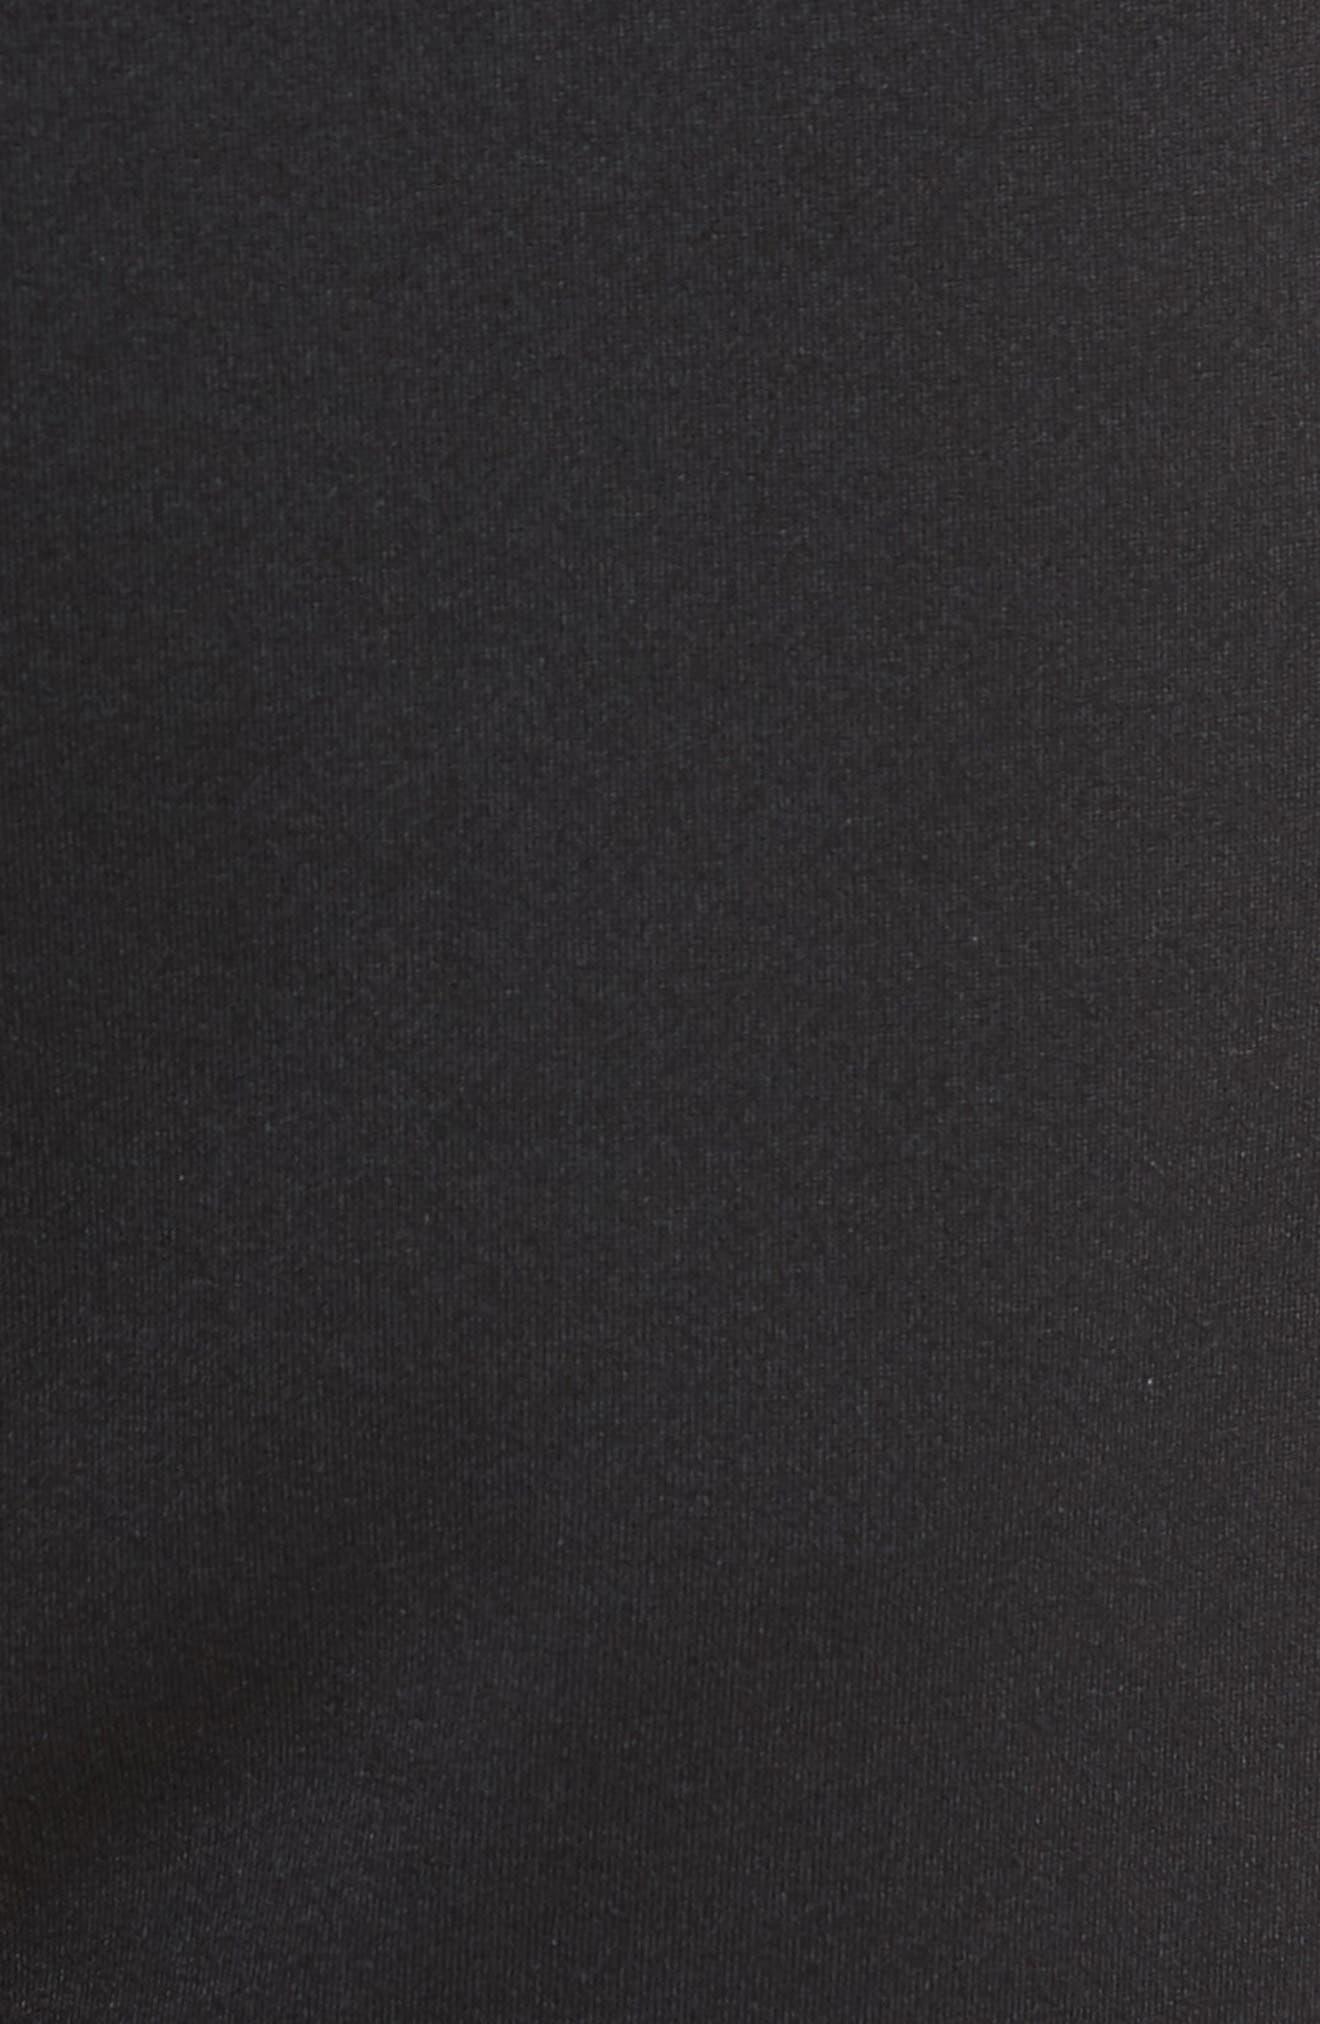 Dry Max Training Shorts,                             Alternate thumbnail 5, color,                             010